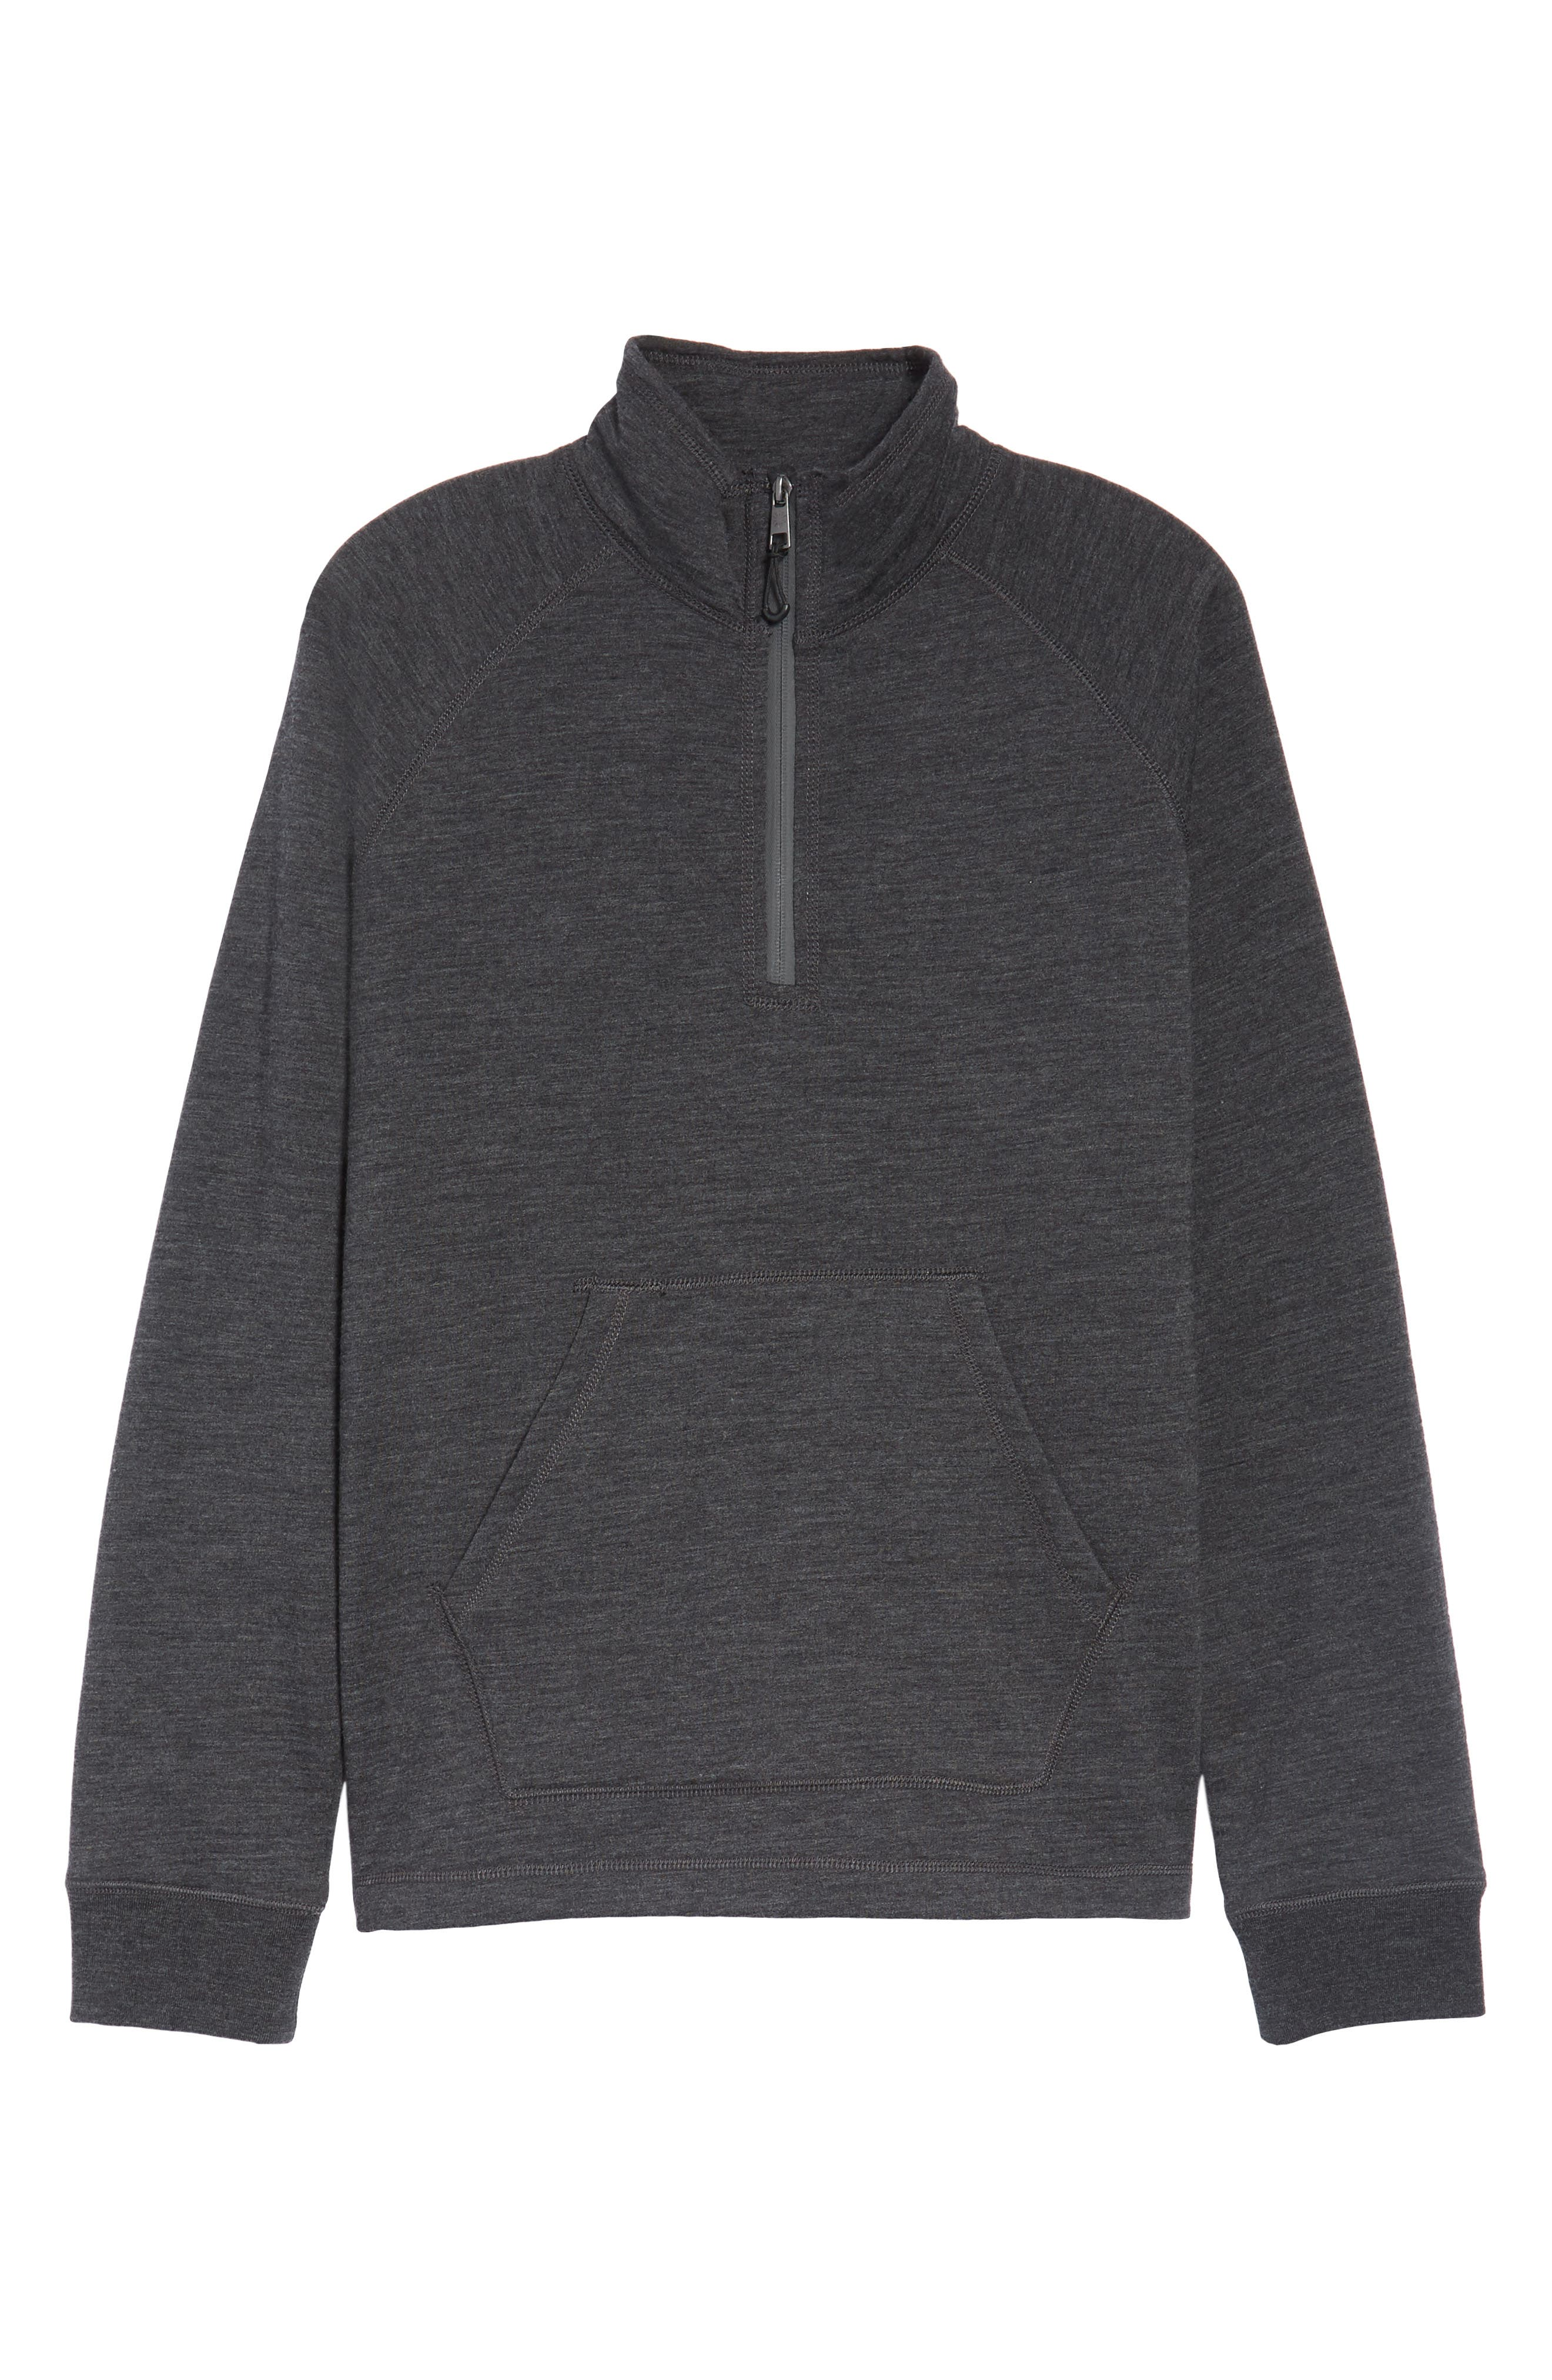 Merino Wool Quarter Zip Pullover,                             Alternate thumbnail 6, color,                             010